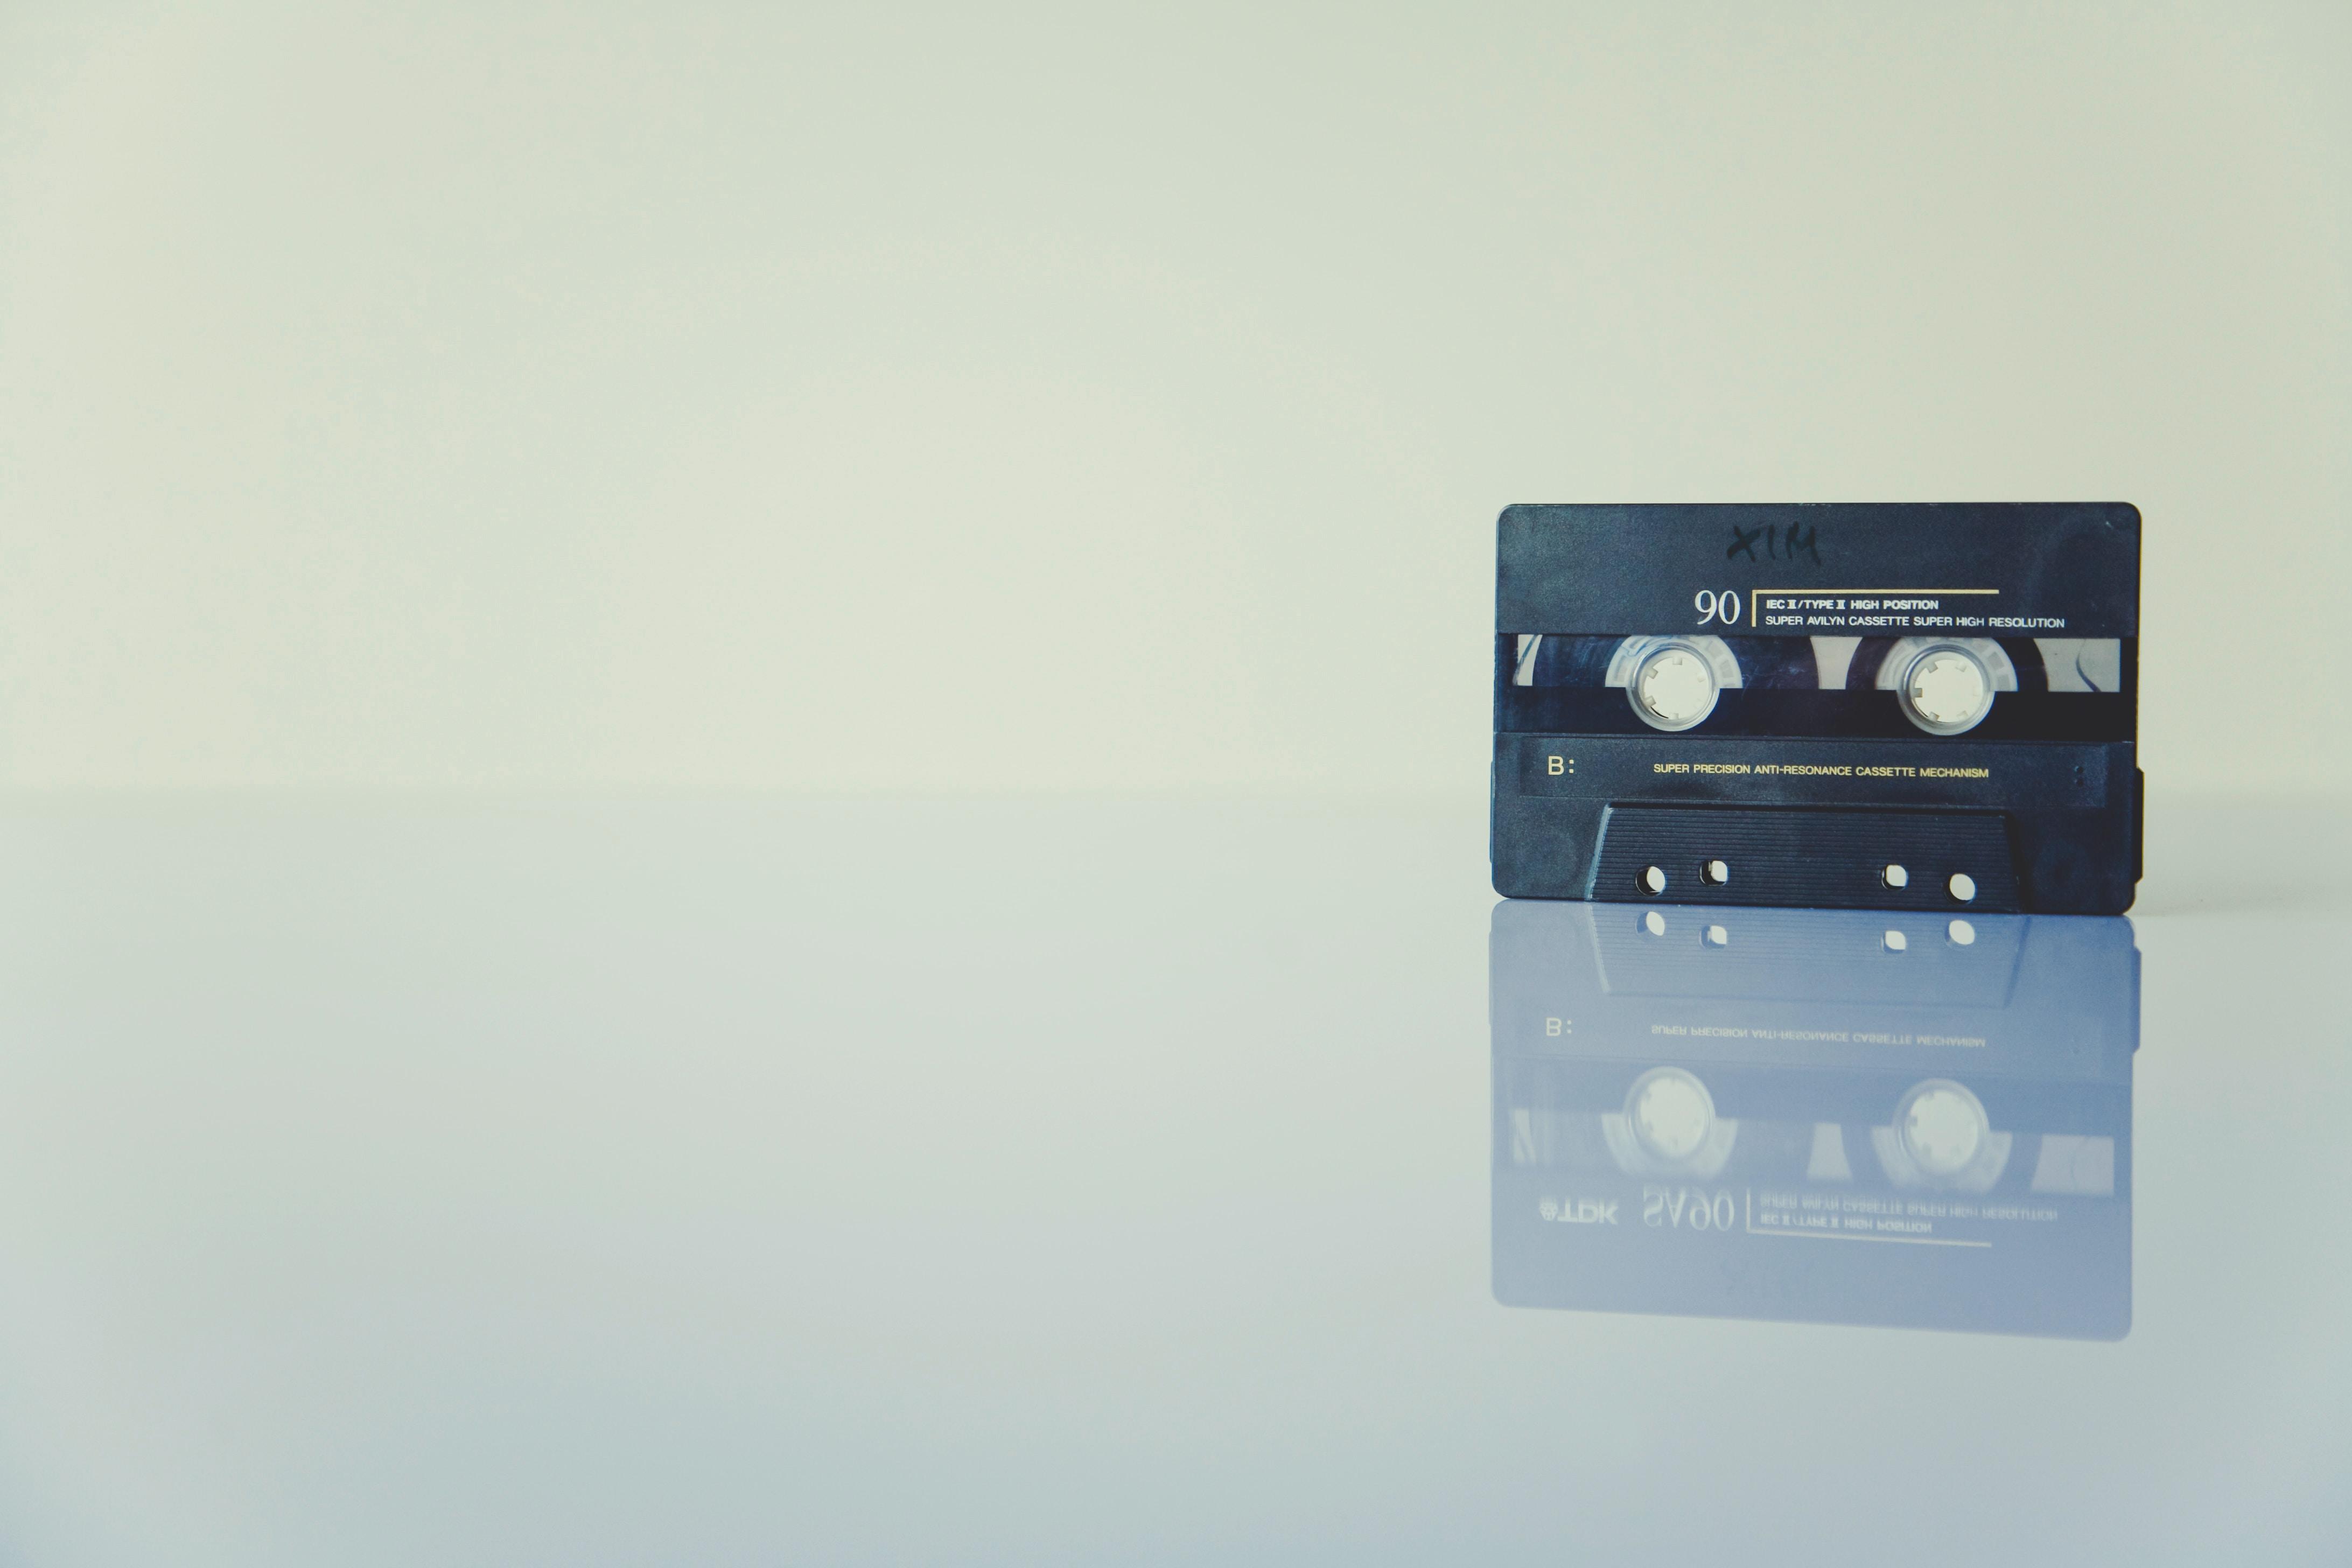 A cassette tape on a flat reflective surface